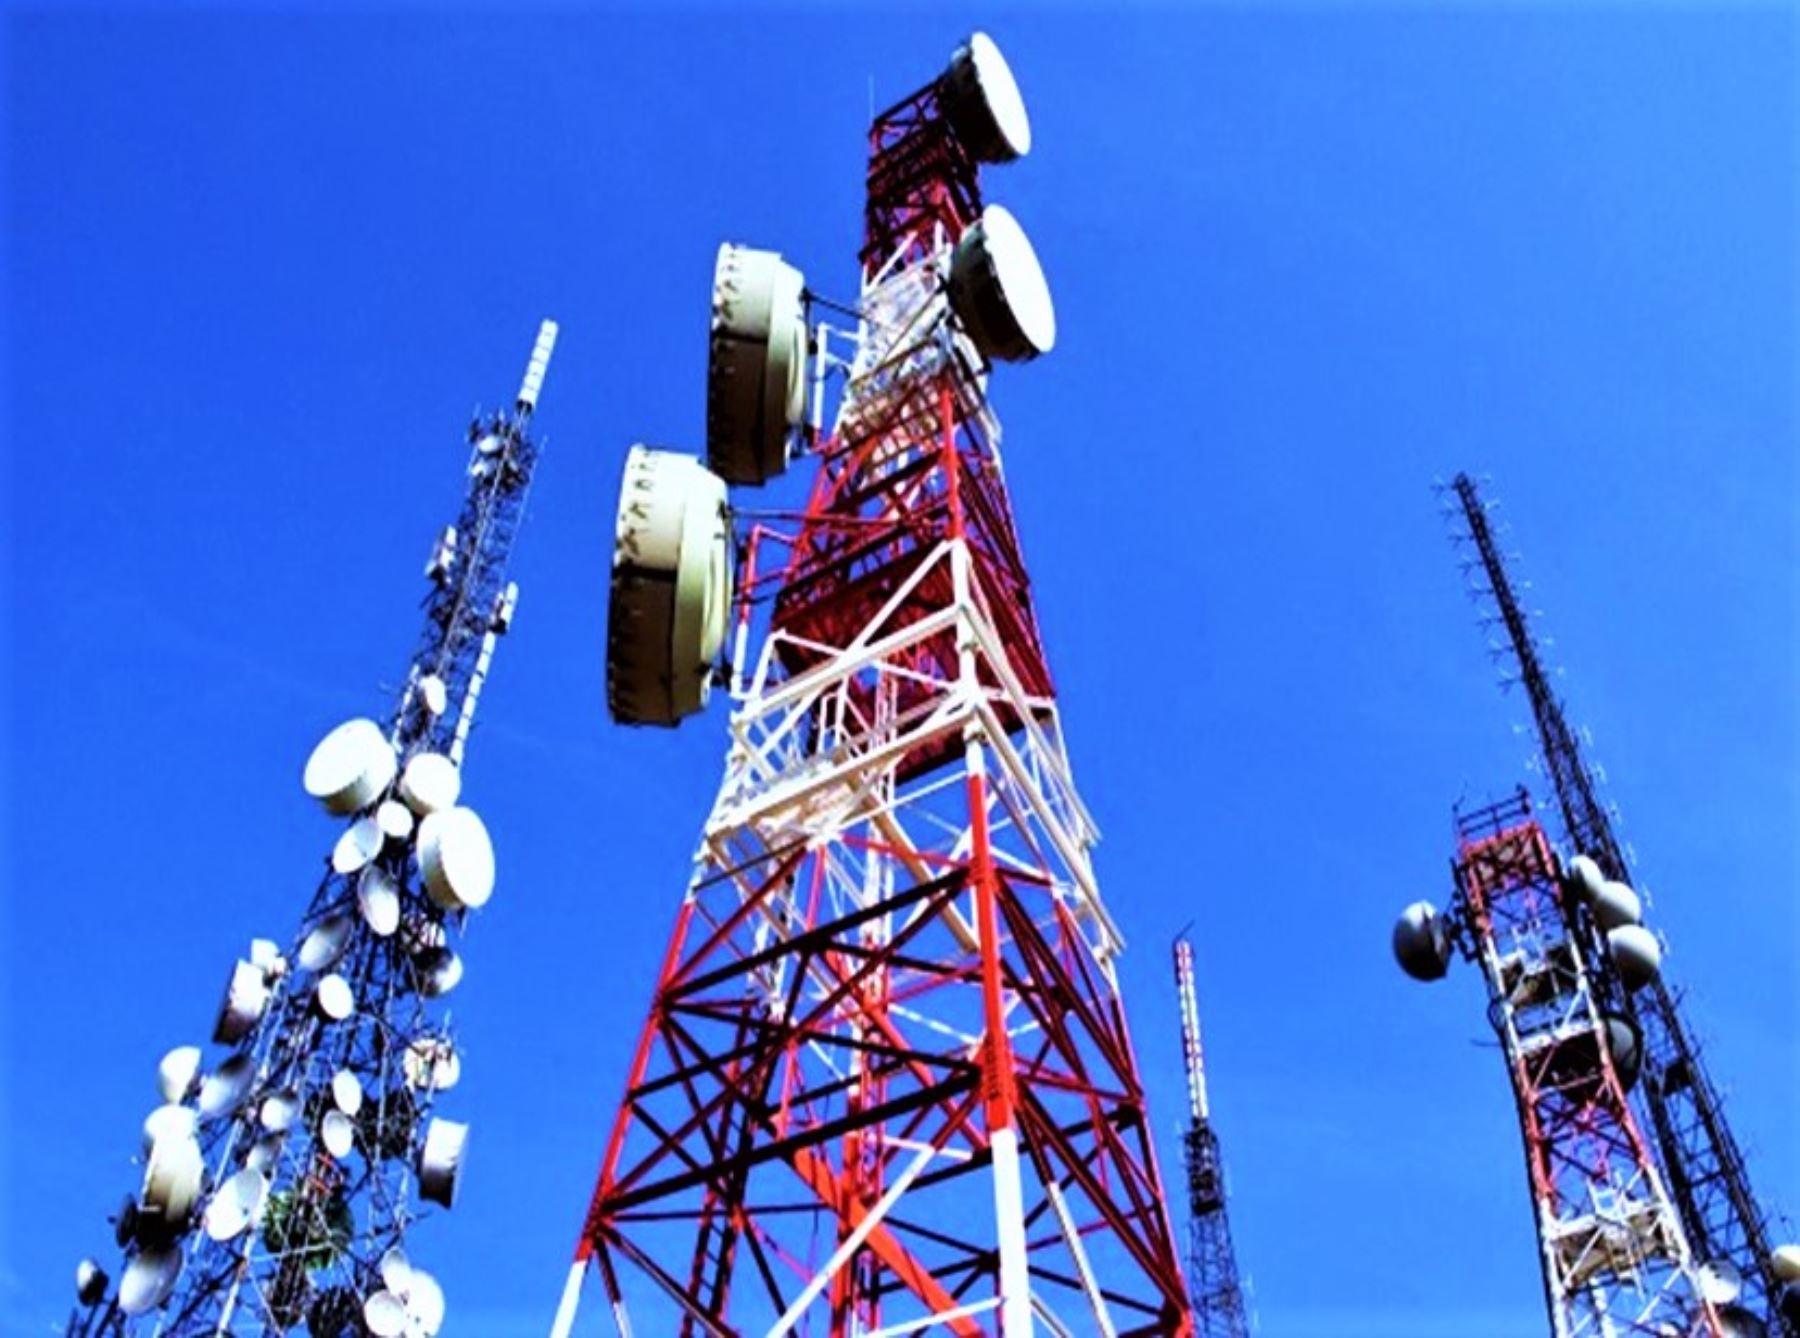 Reportan afectación de servicios de telefonía móvil e internet en Apurímac. ANDINA/Difusión